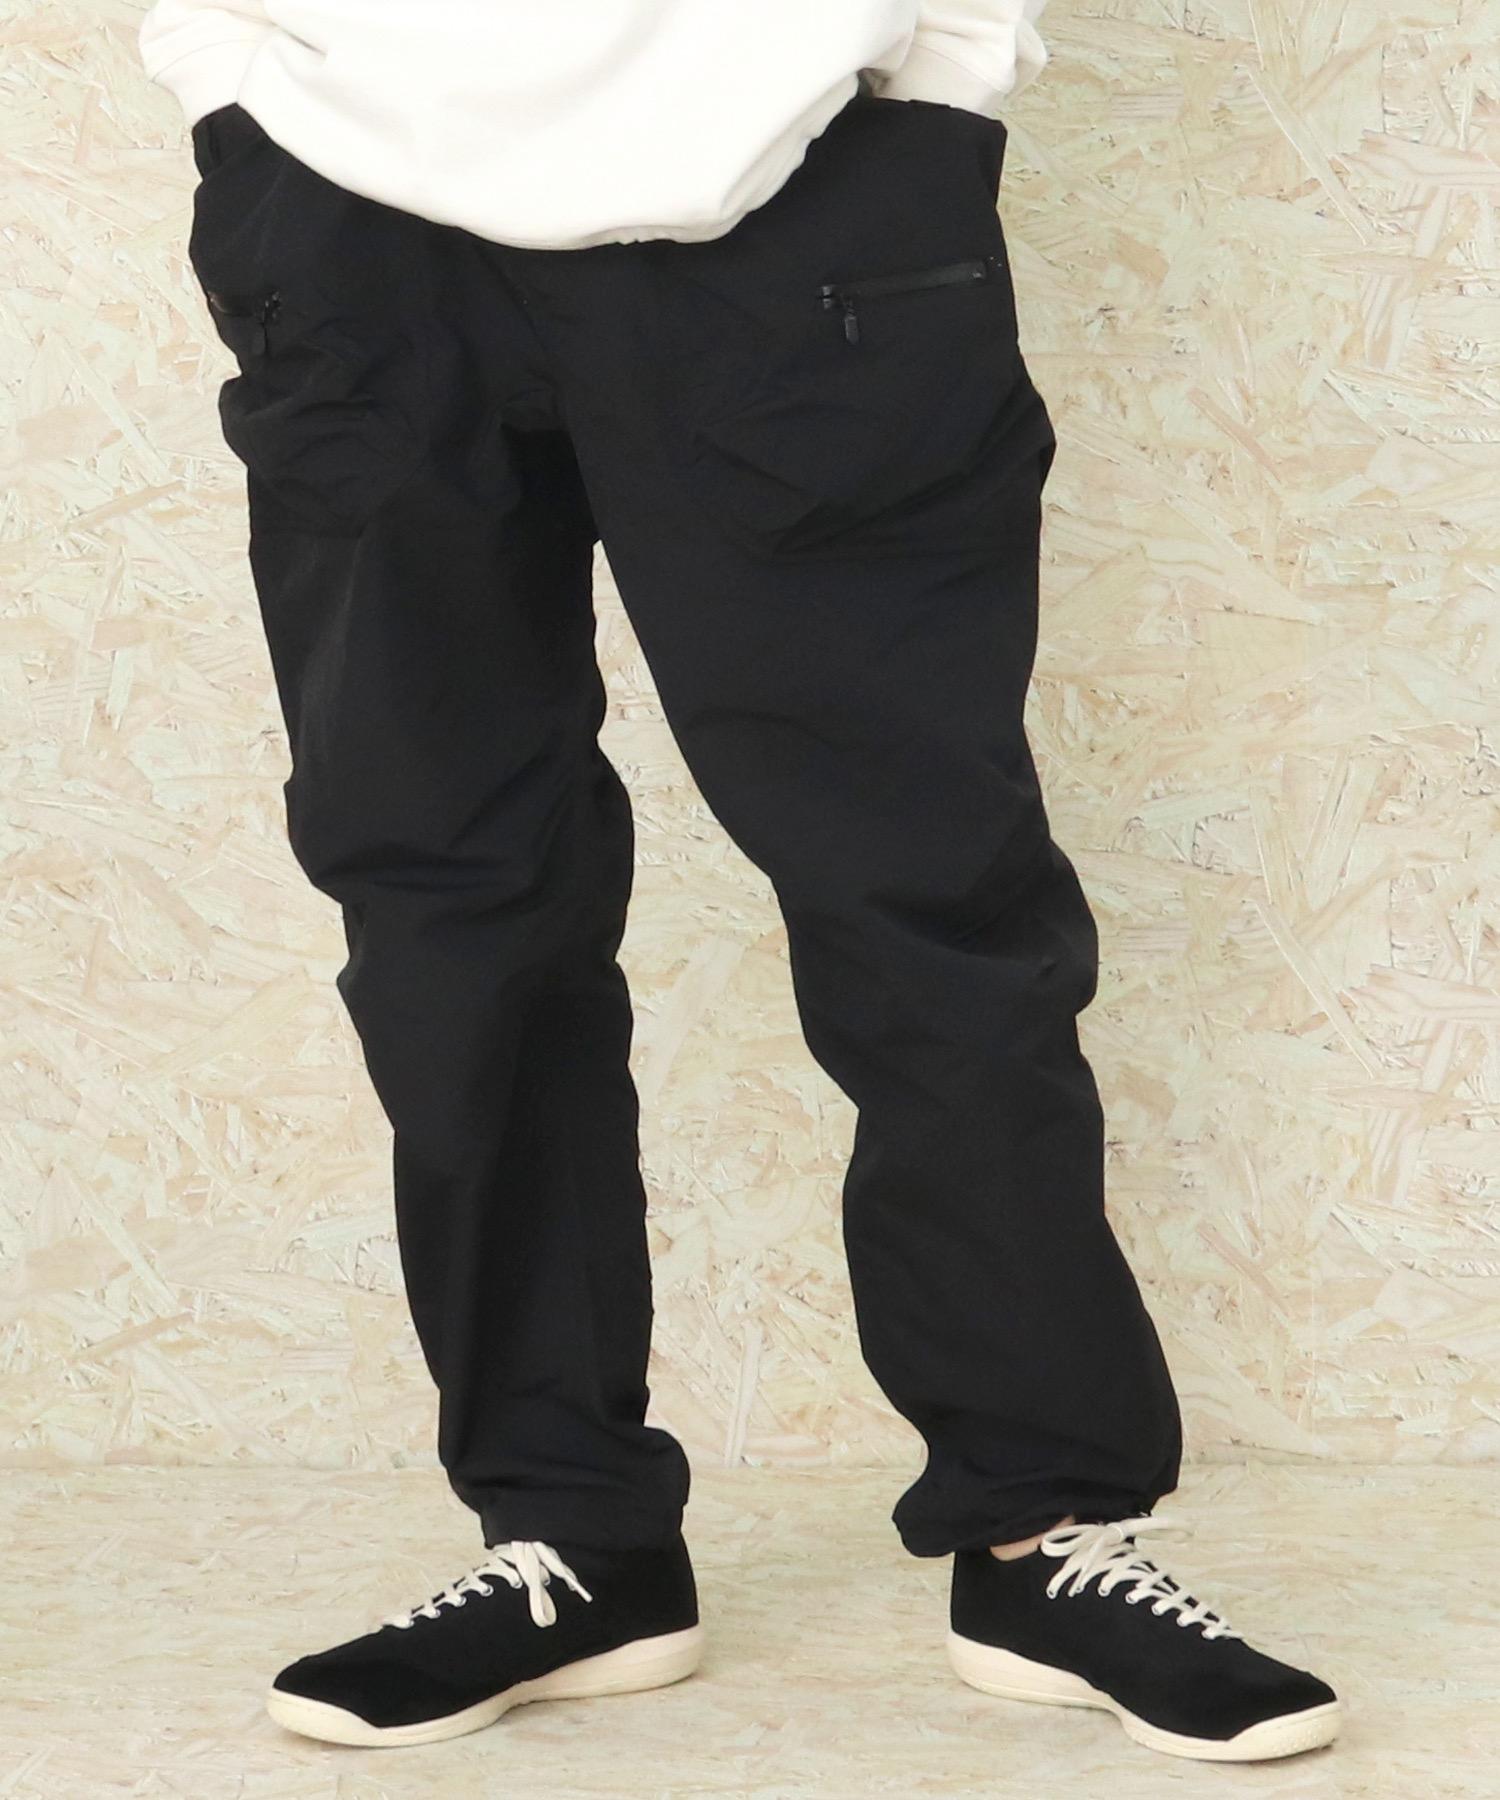 【MOUNTAIN SMITH/マウンテンスミス】2020SS Garfield Pants